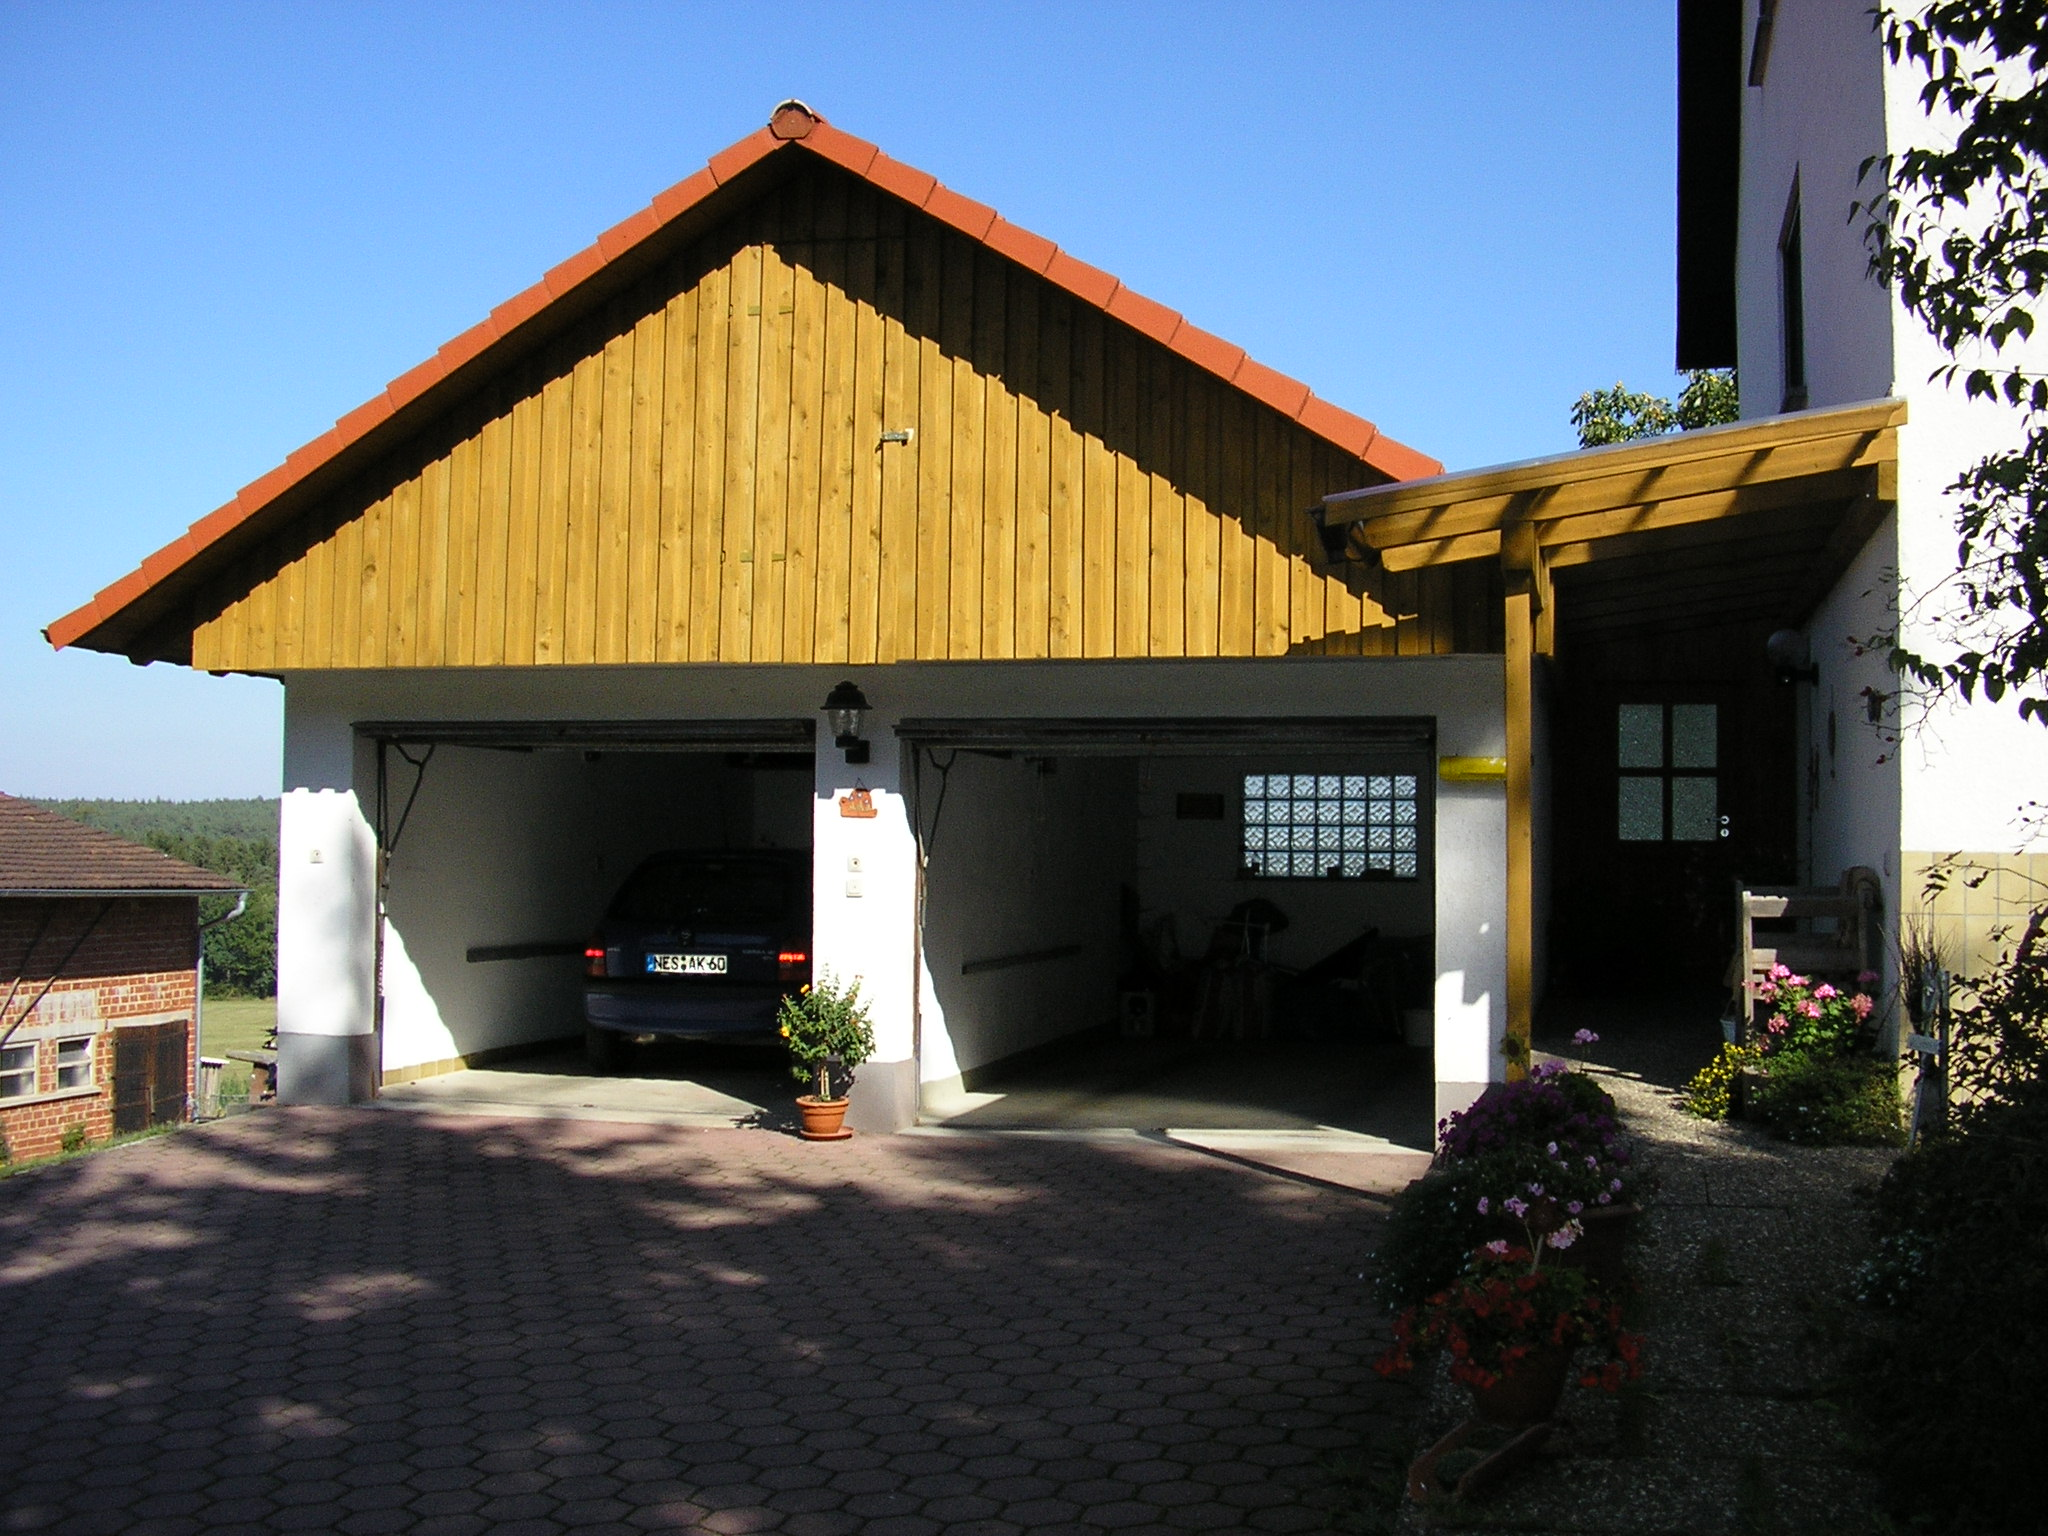 Balkon/Carport